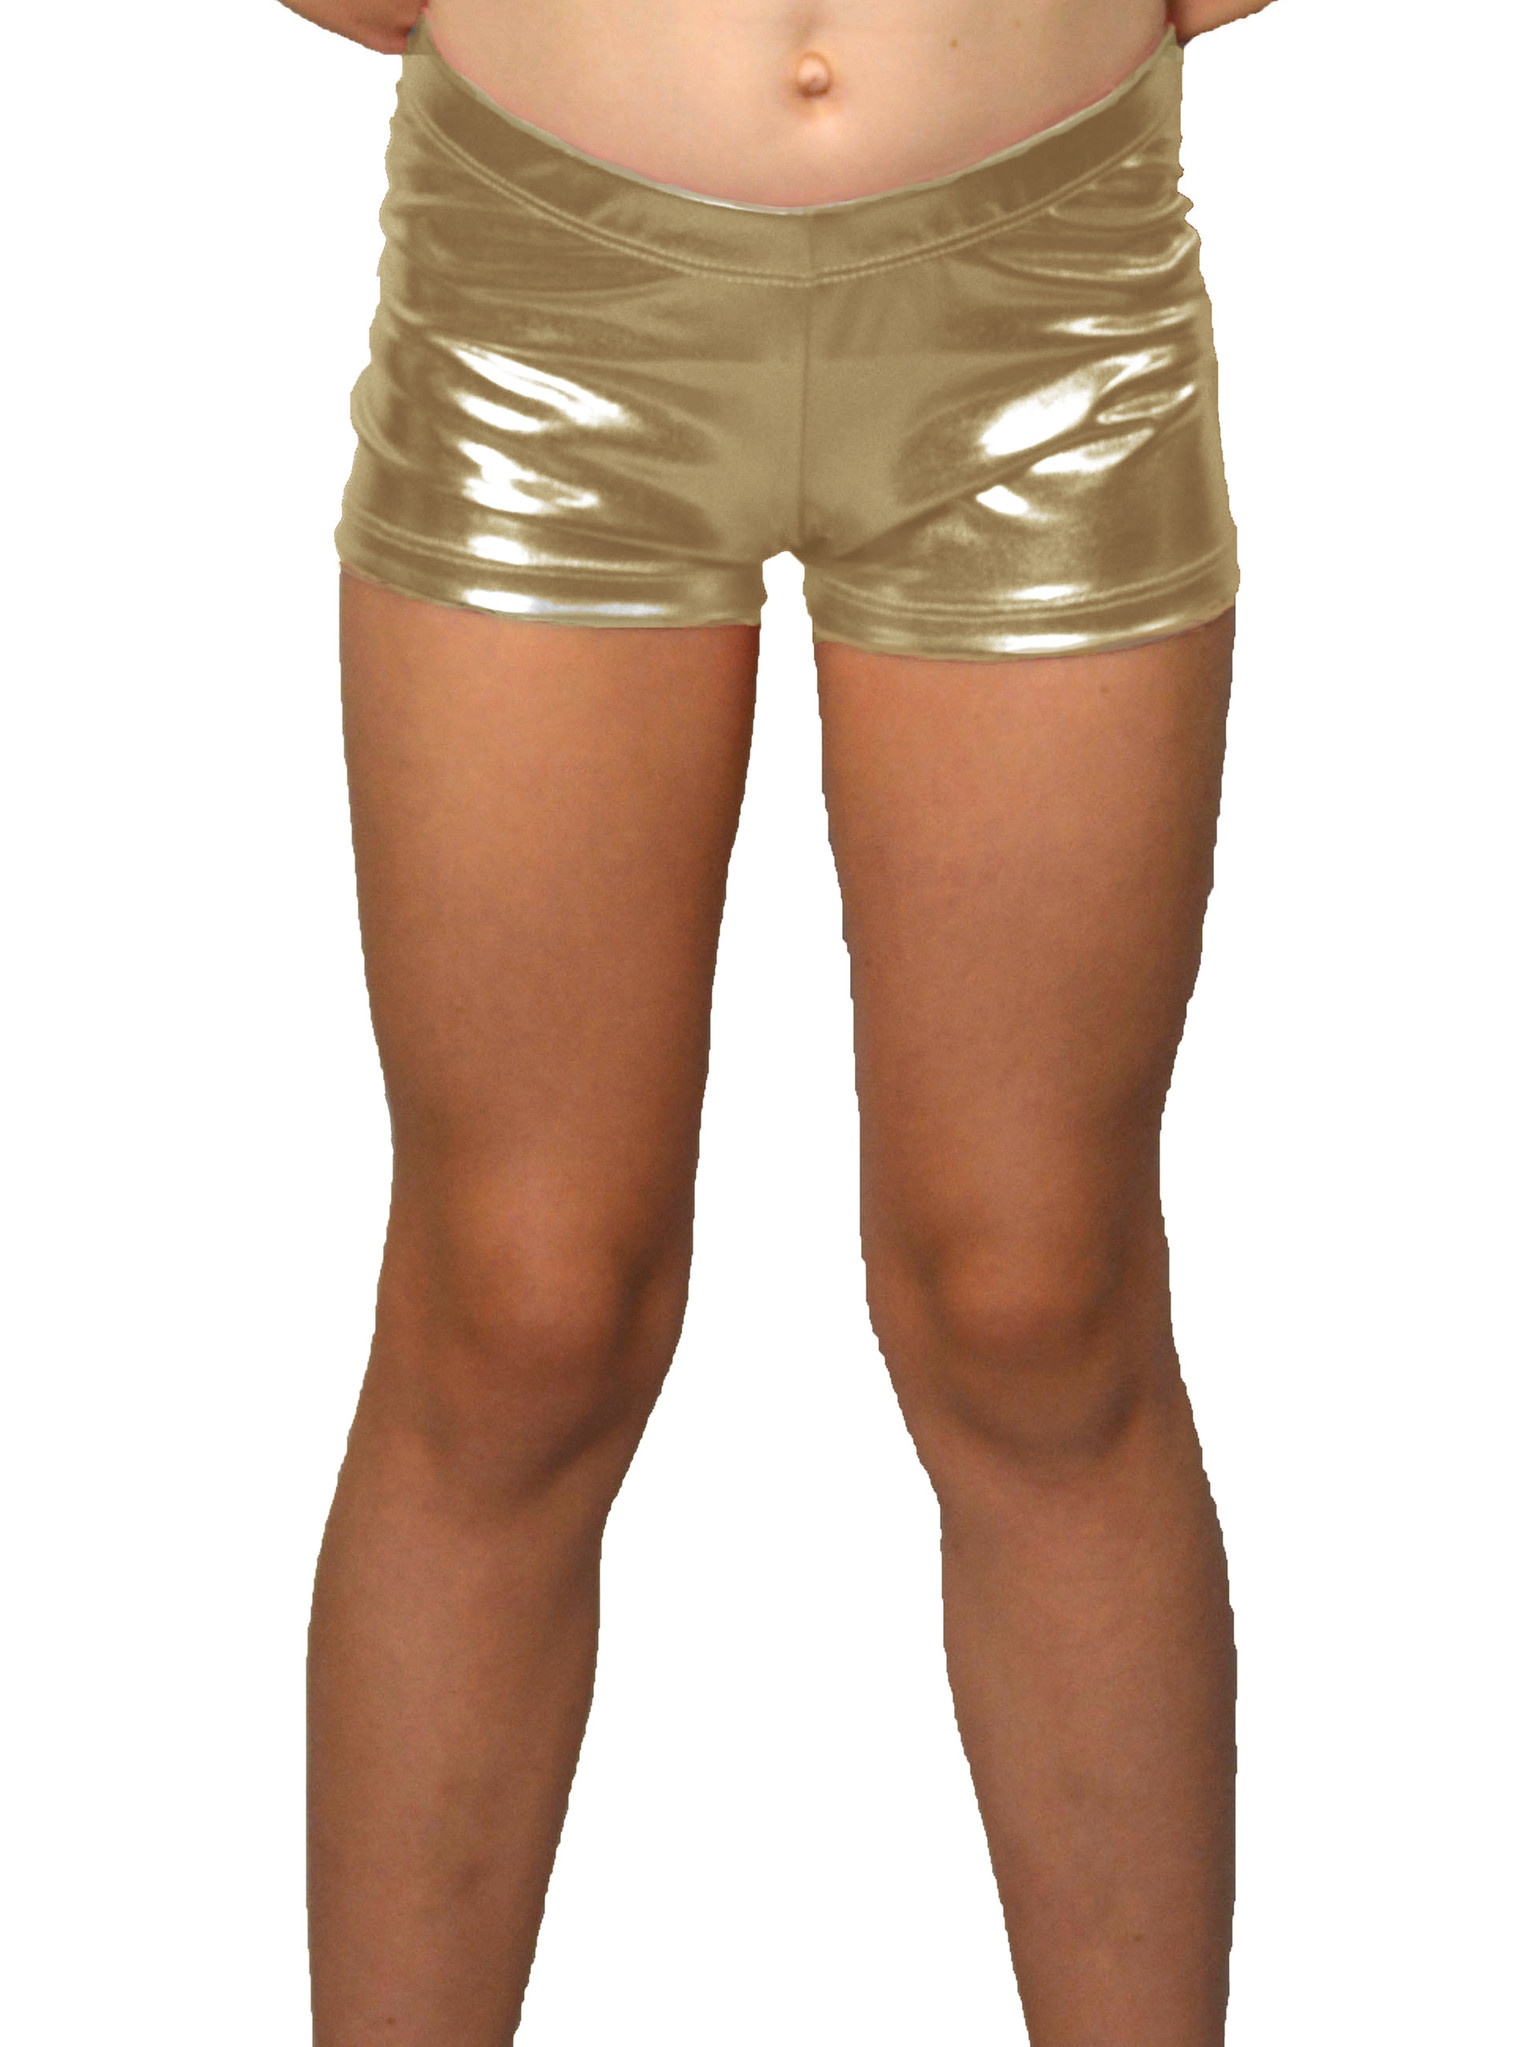 Girl's Foil Metallic Booty Shorts - X Small (4) / Metallic Black